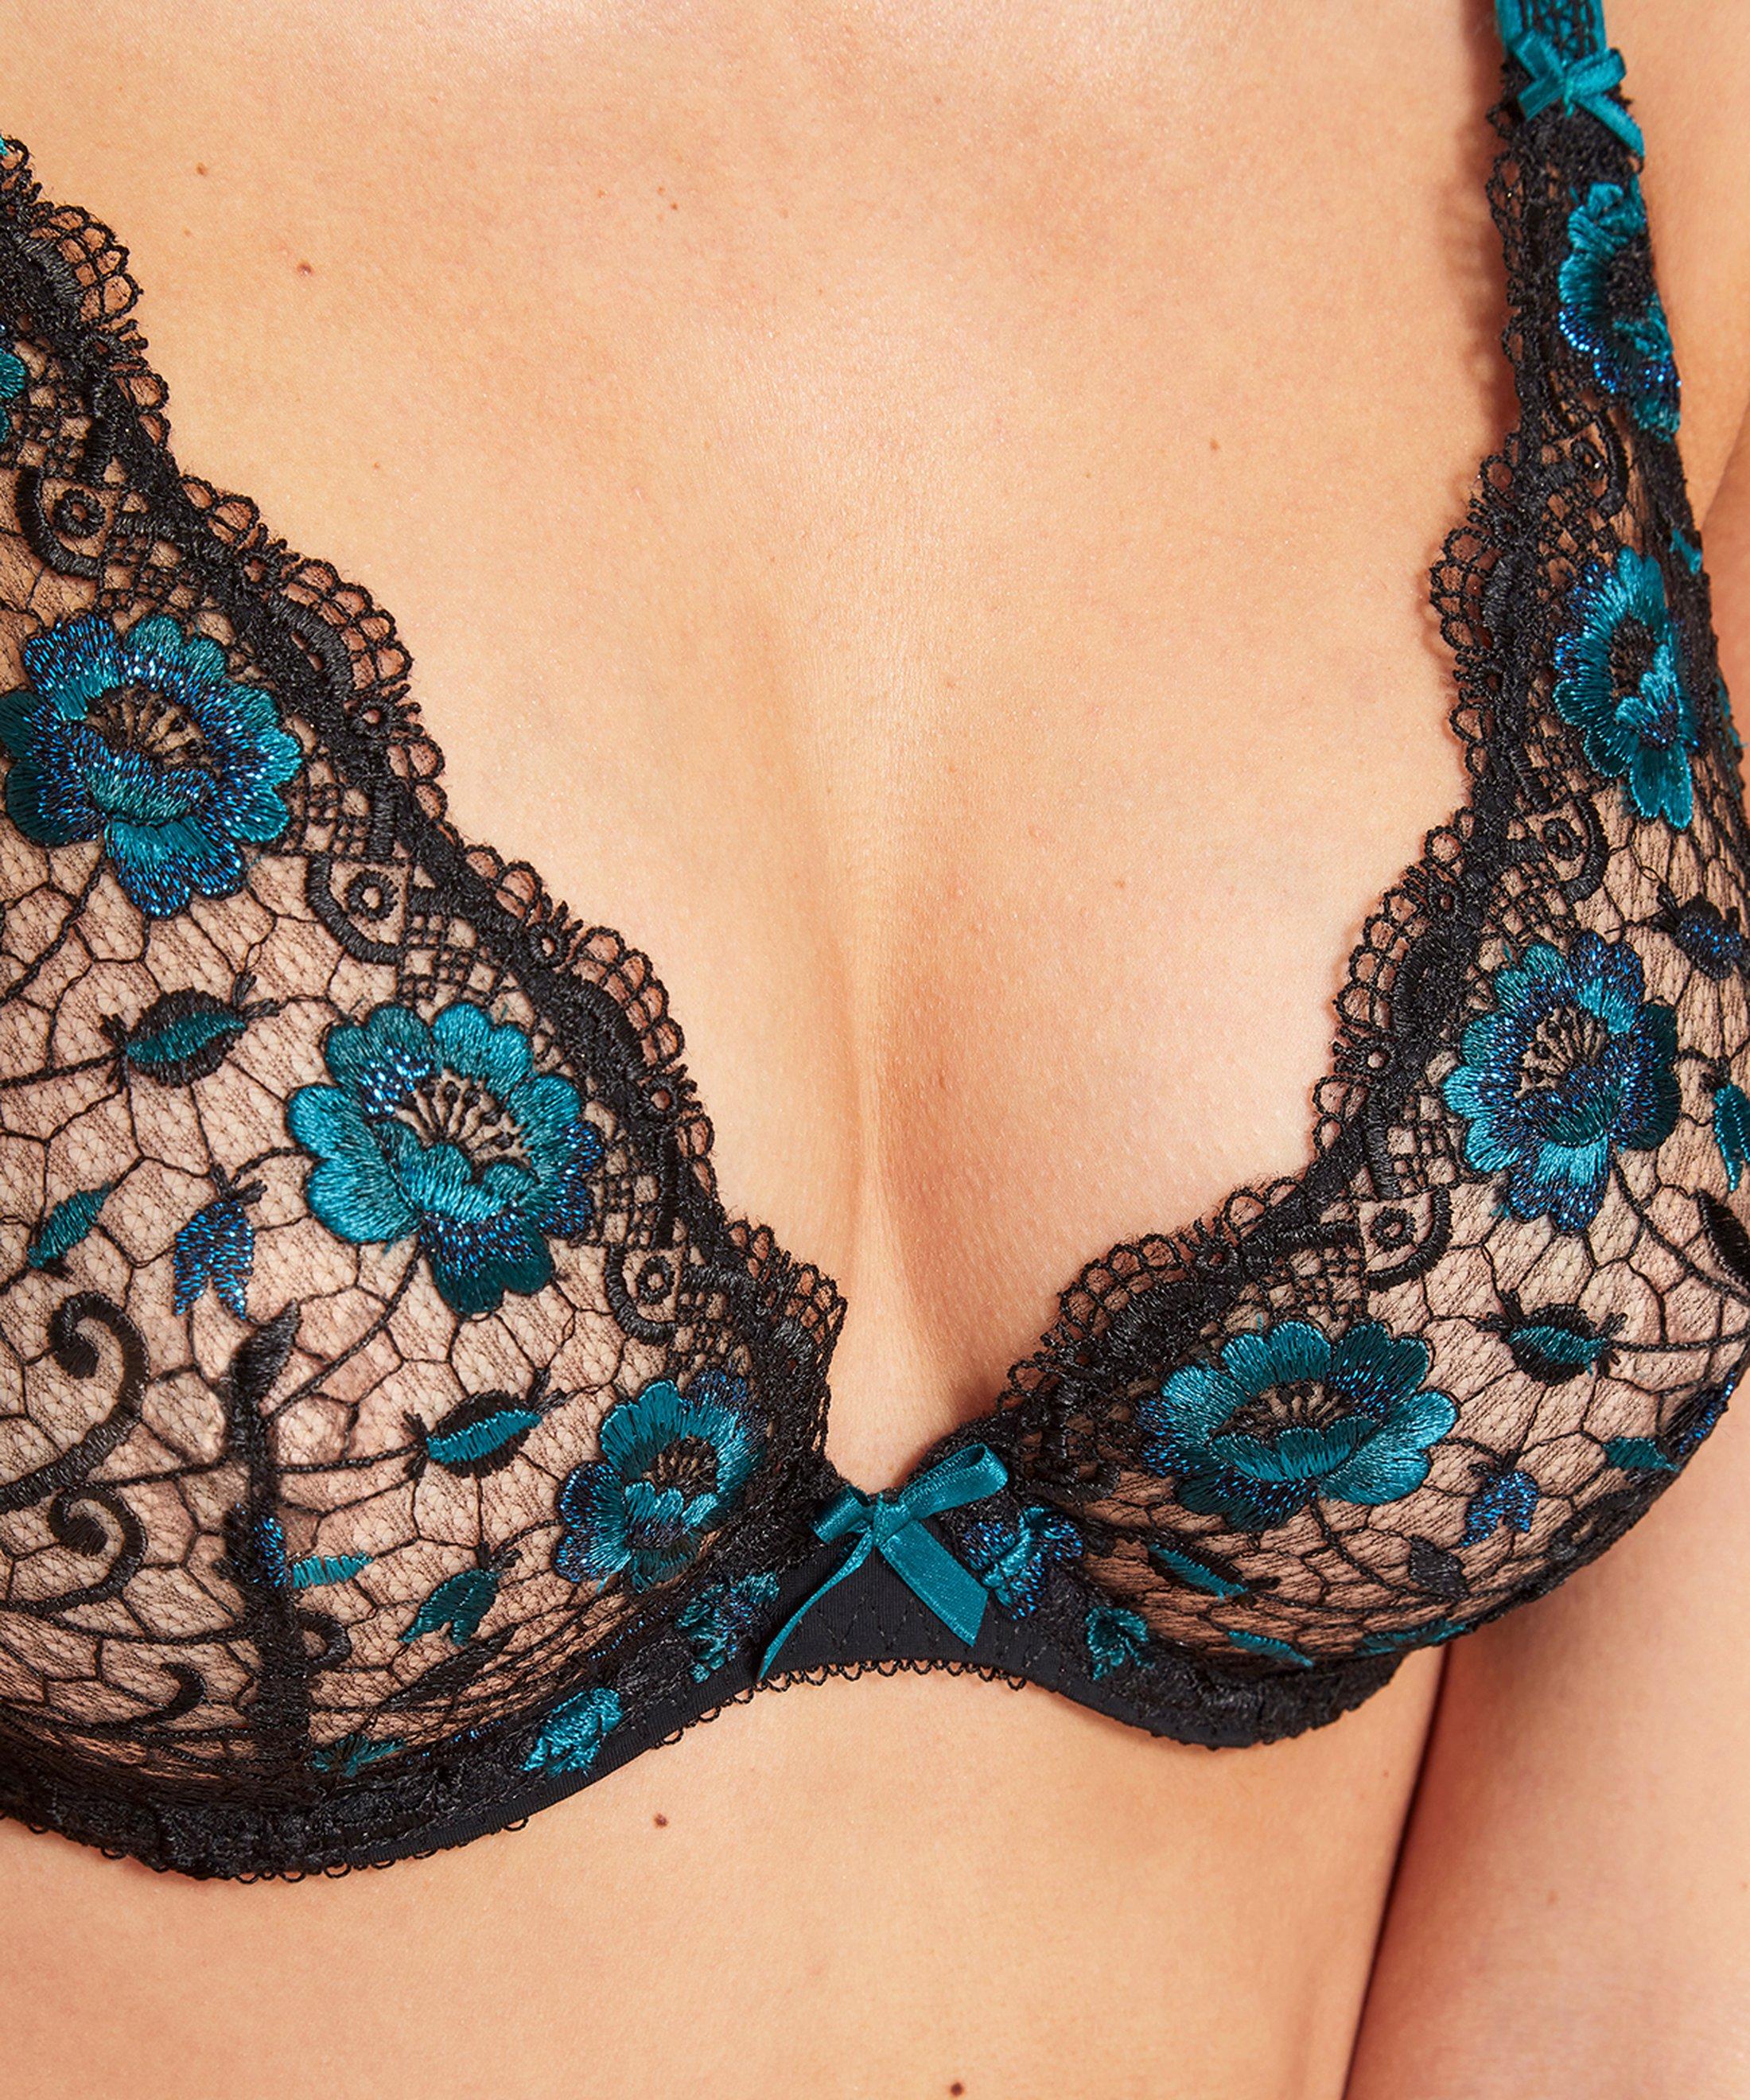 FIÈVRE ANDALOUSE Plunge triangle bra Black Lapis-Lazuli | Aubade